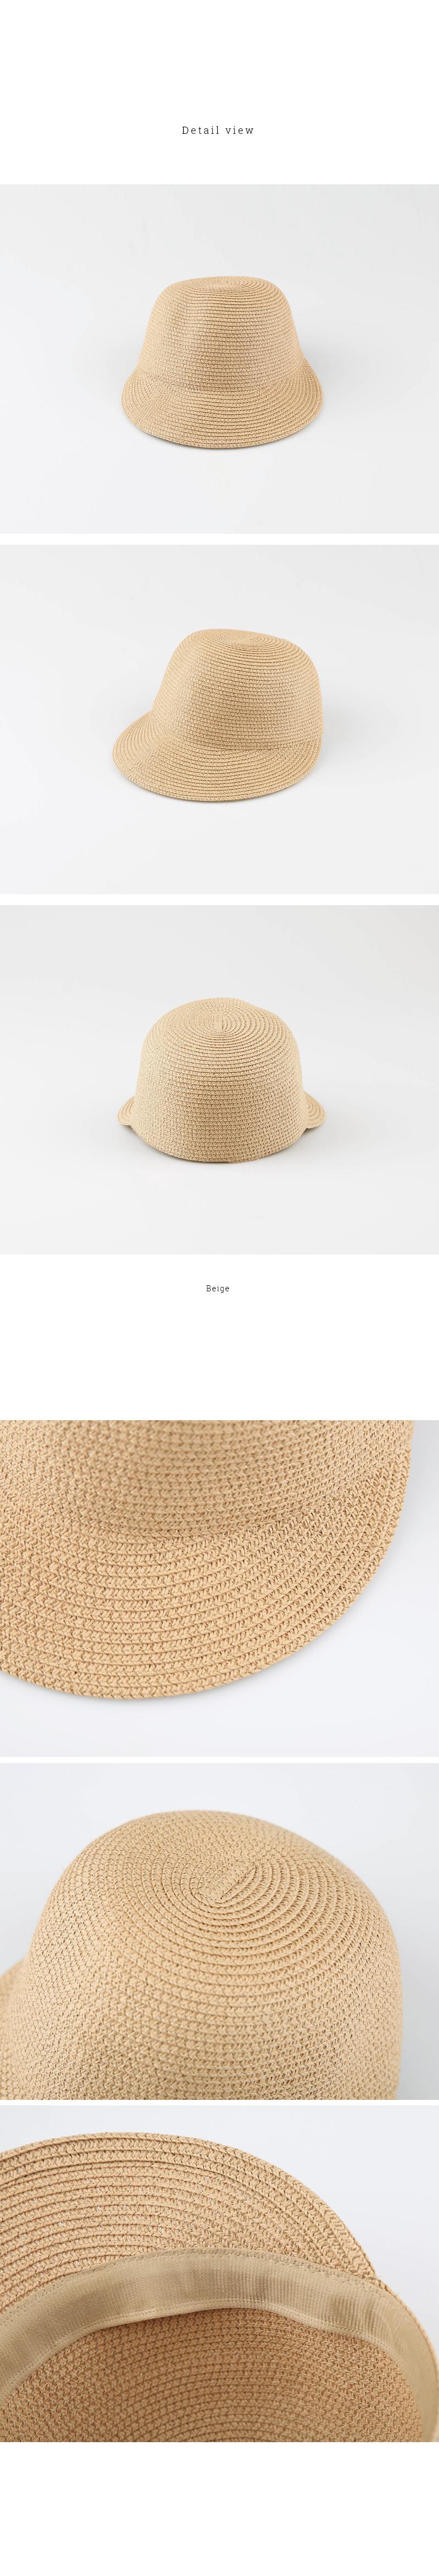 Paper cap